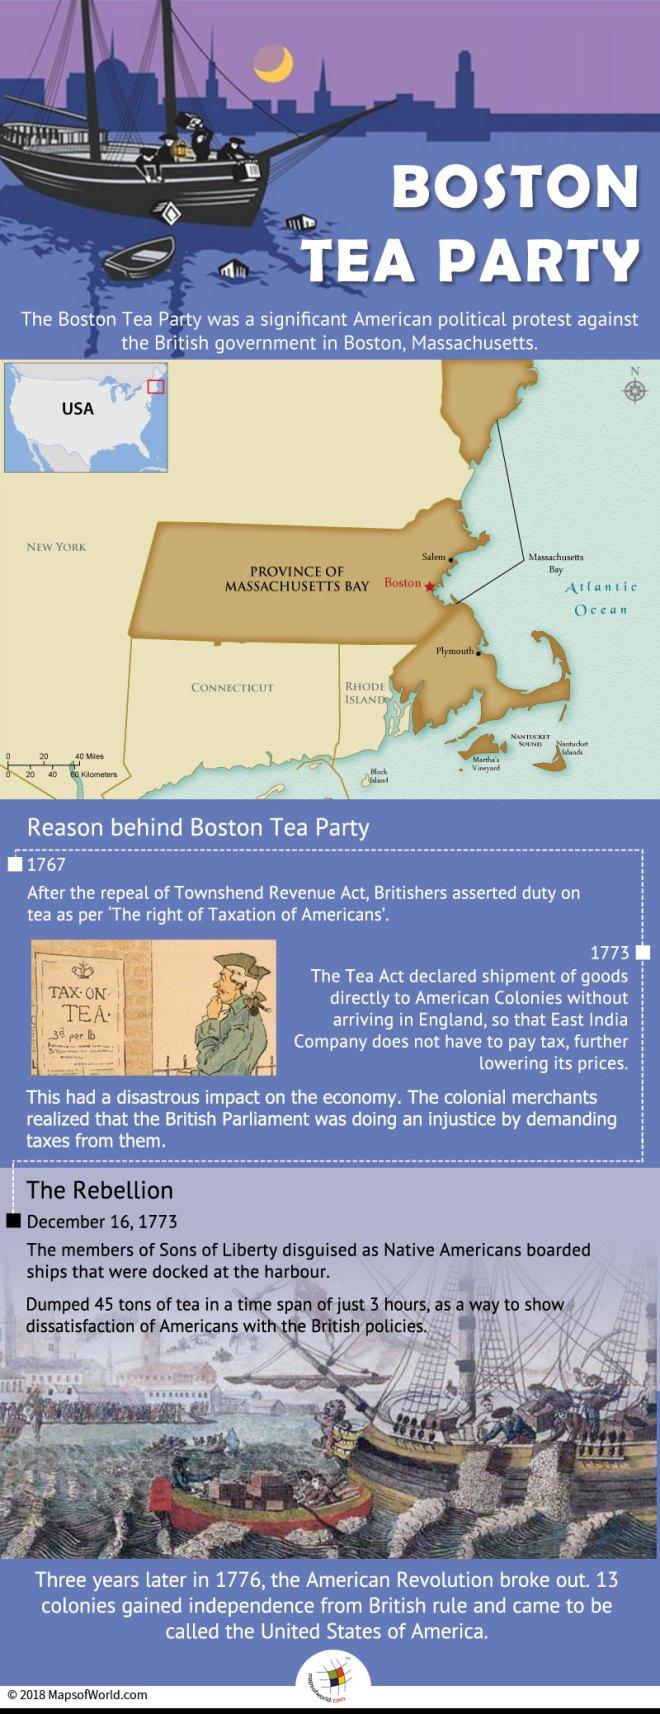 Infographic elaborating what led to Boston Tea Party